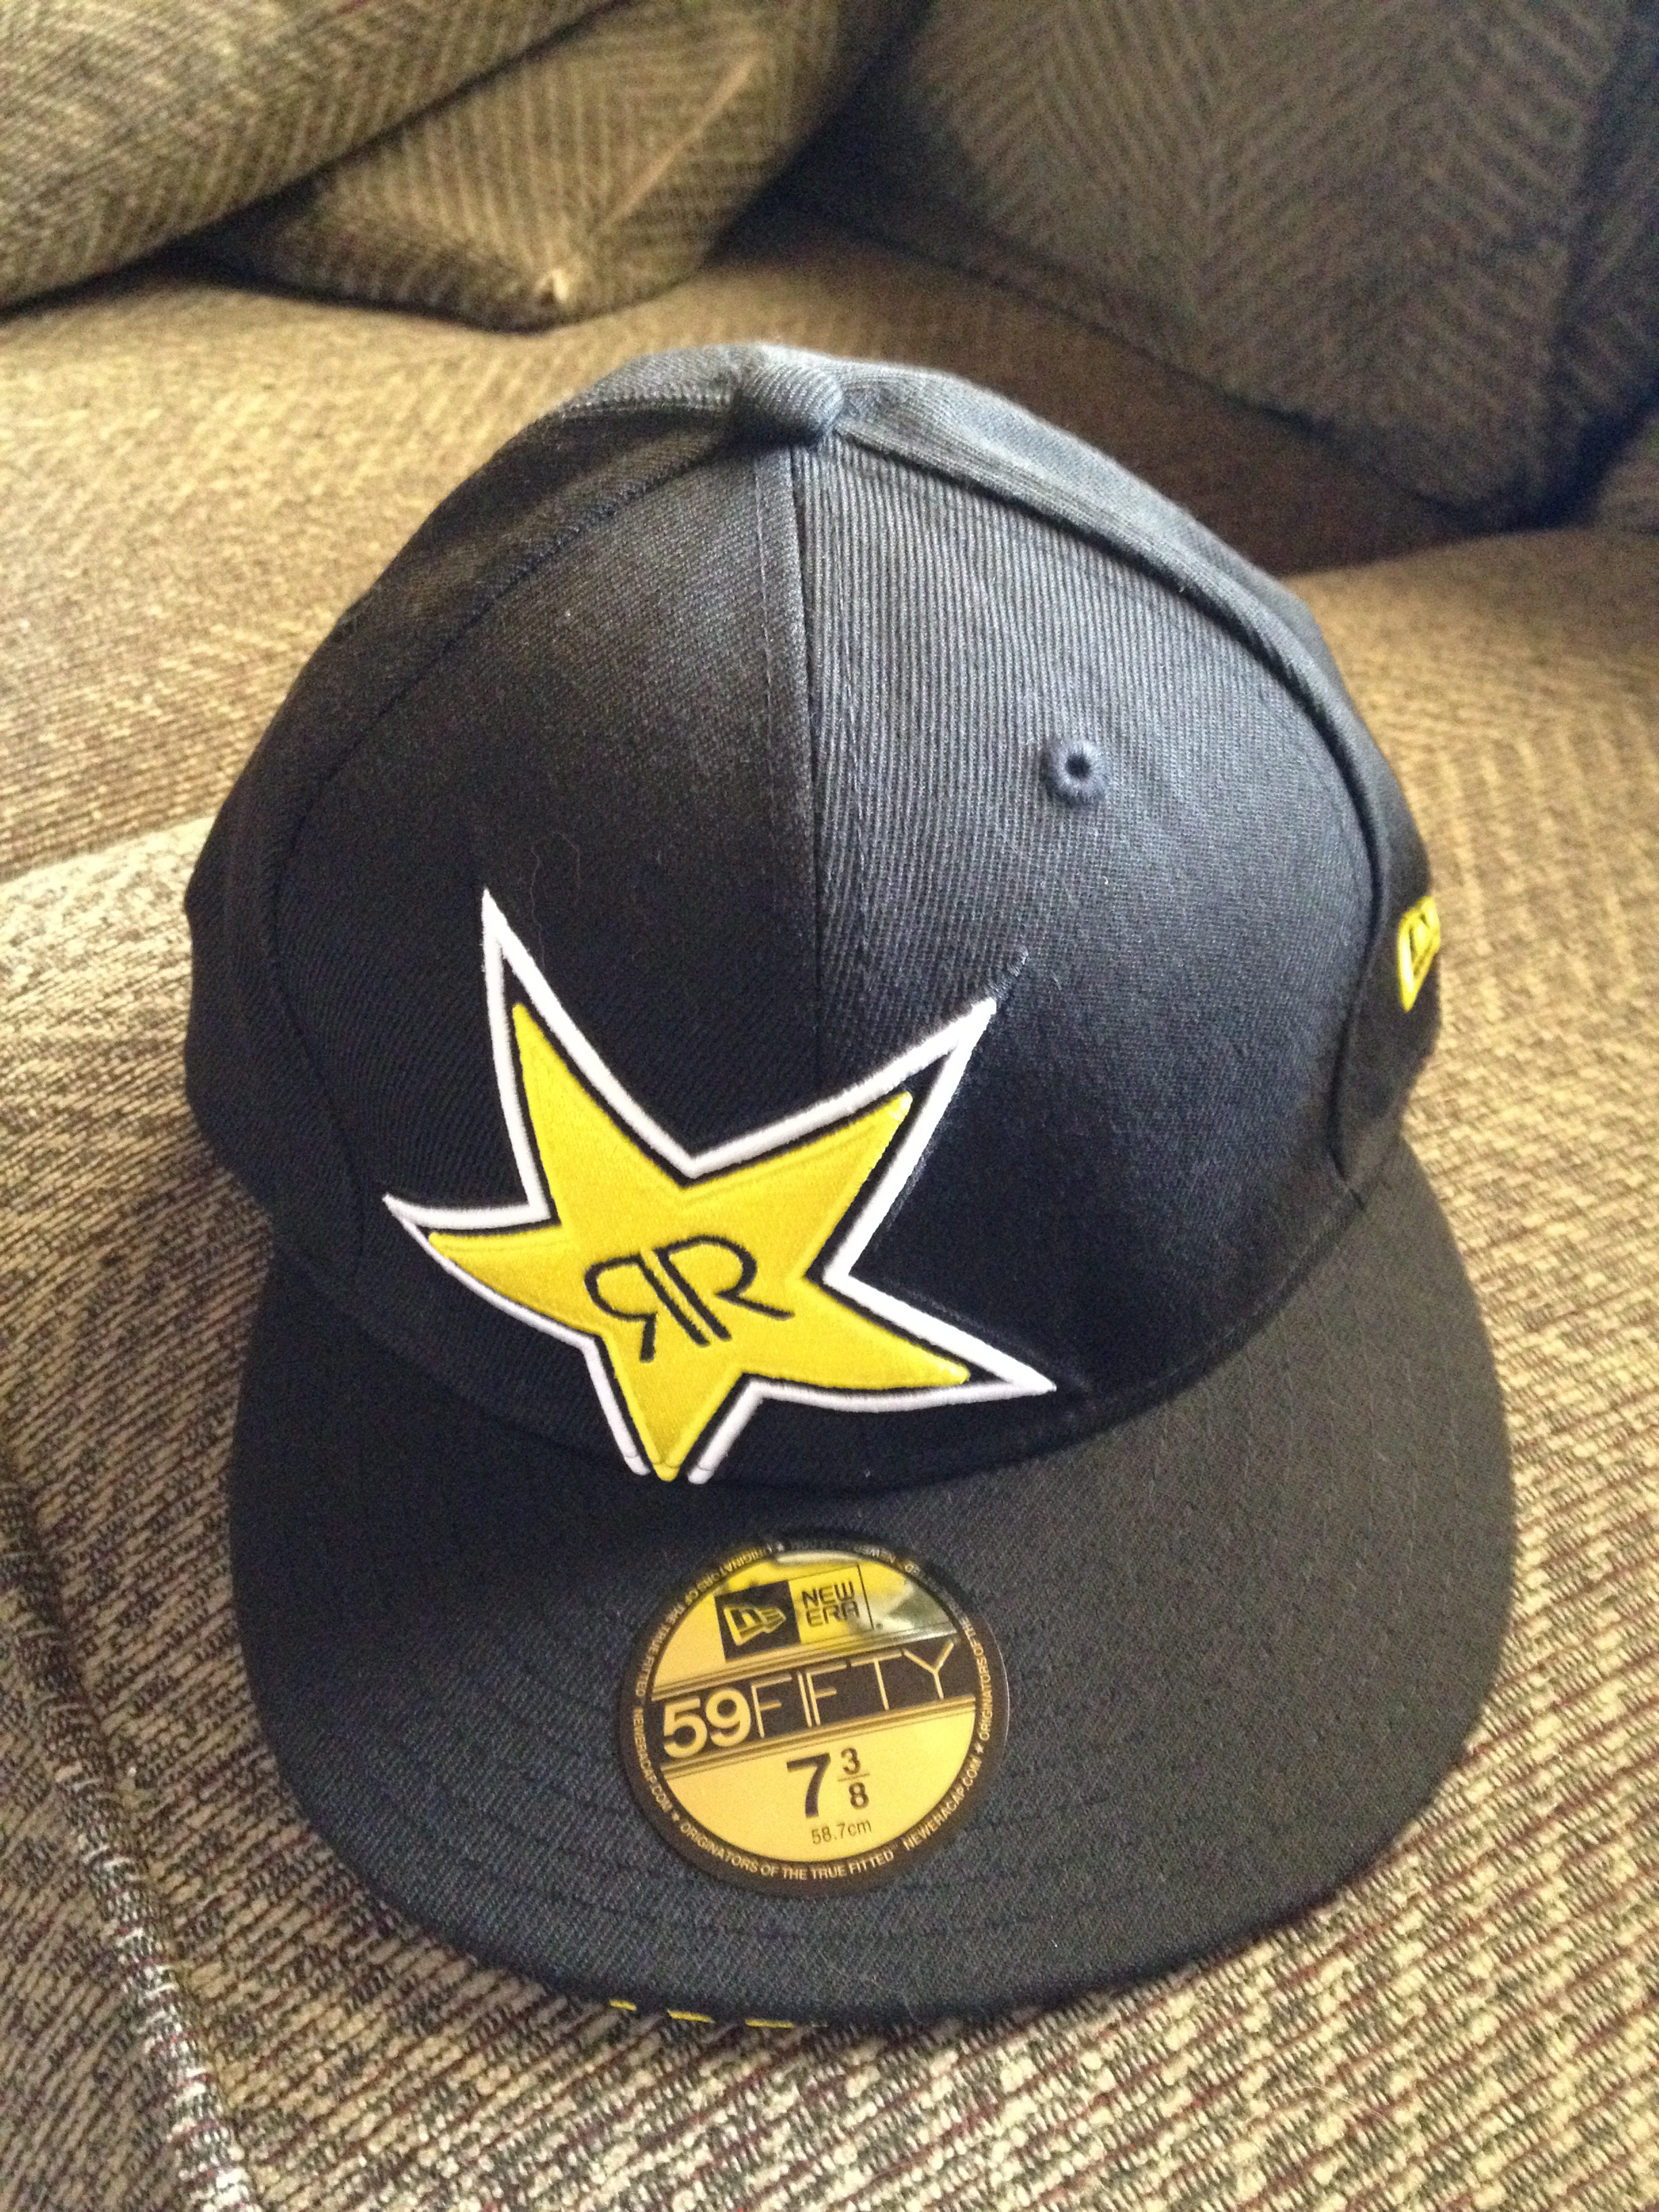 ROCKSTAR New Era Hat - Sell and Trade - Newschoolers.com 39350340453